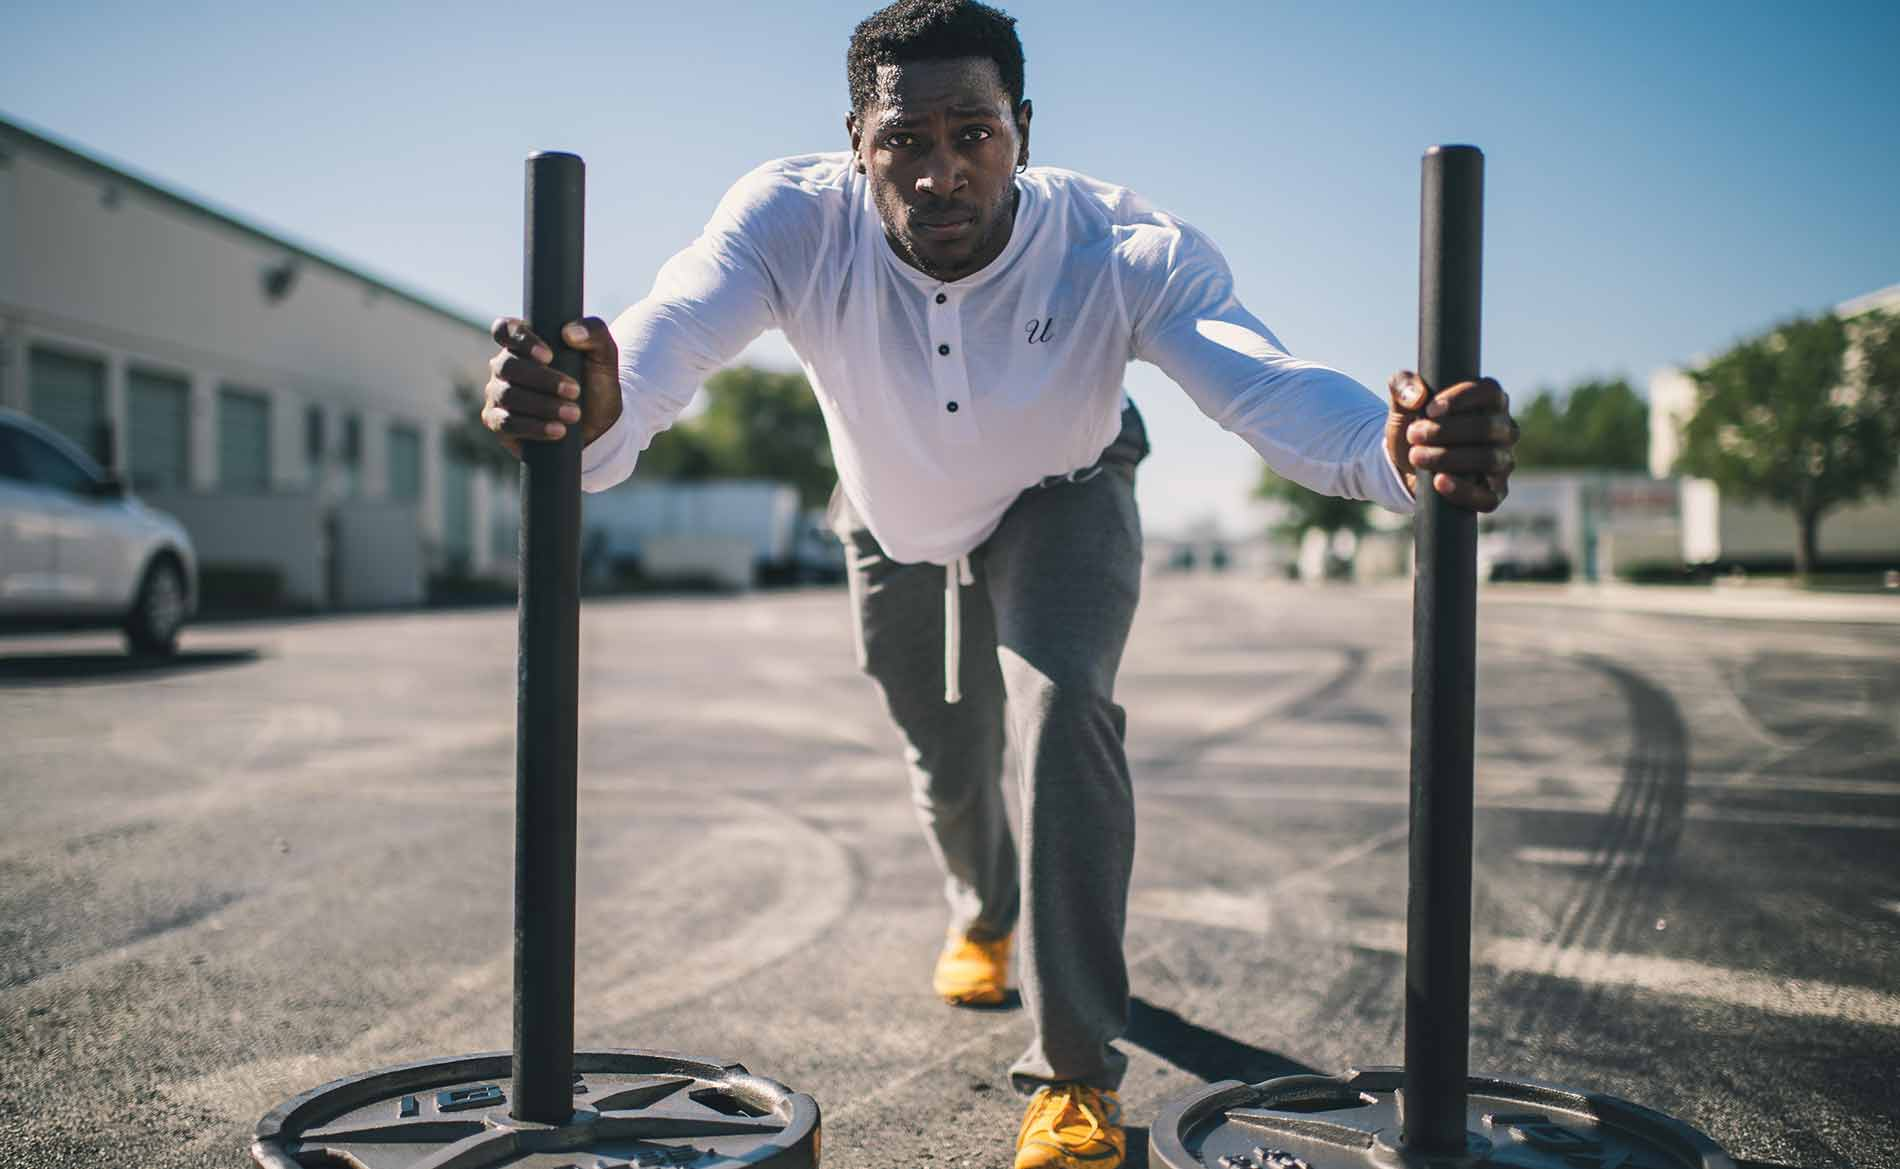 Athlete High Intensity Training